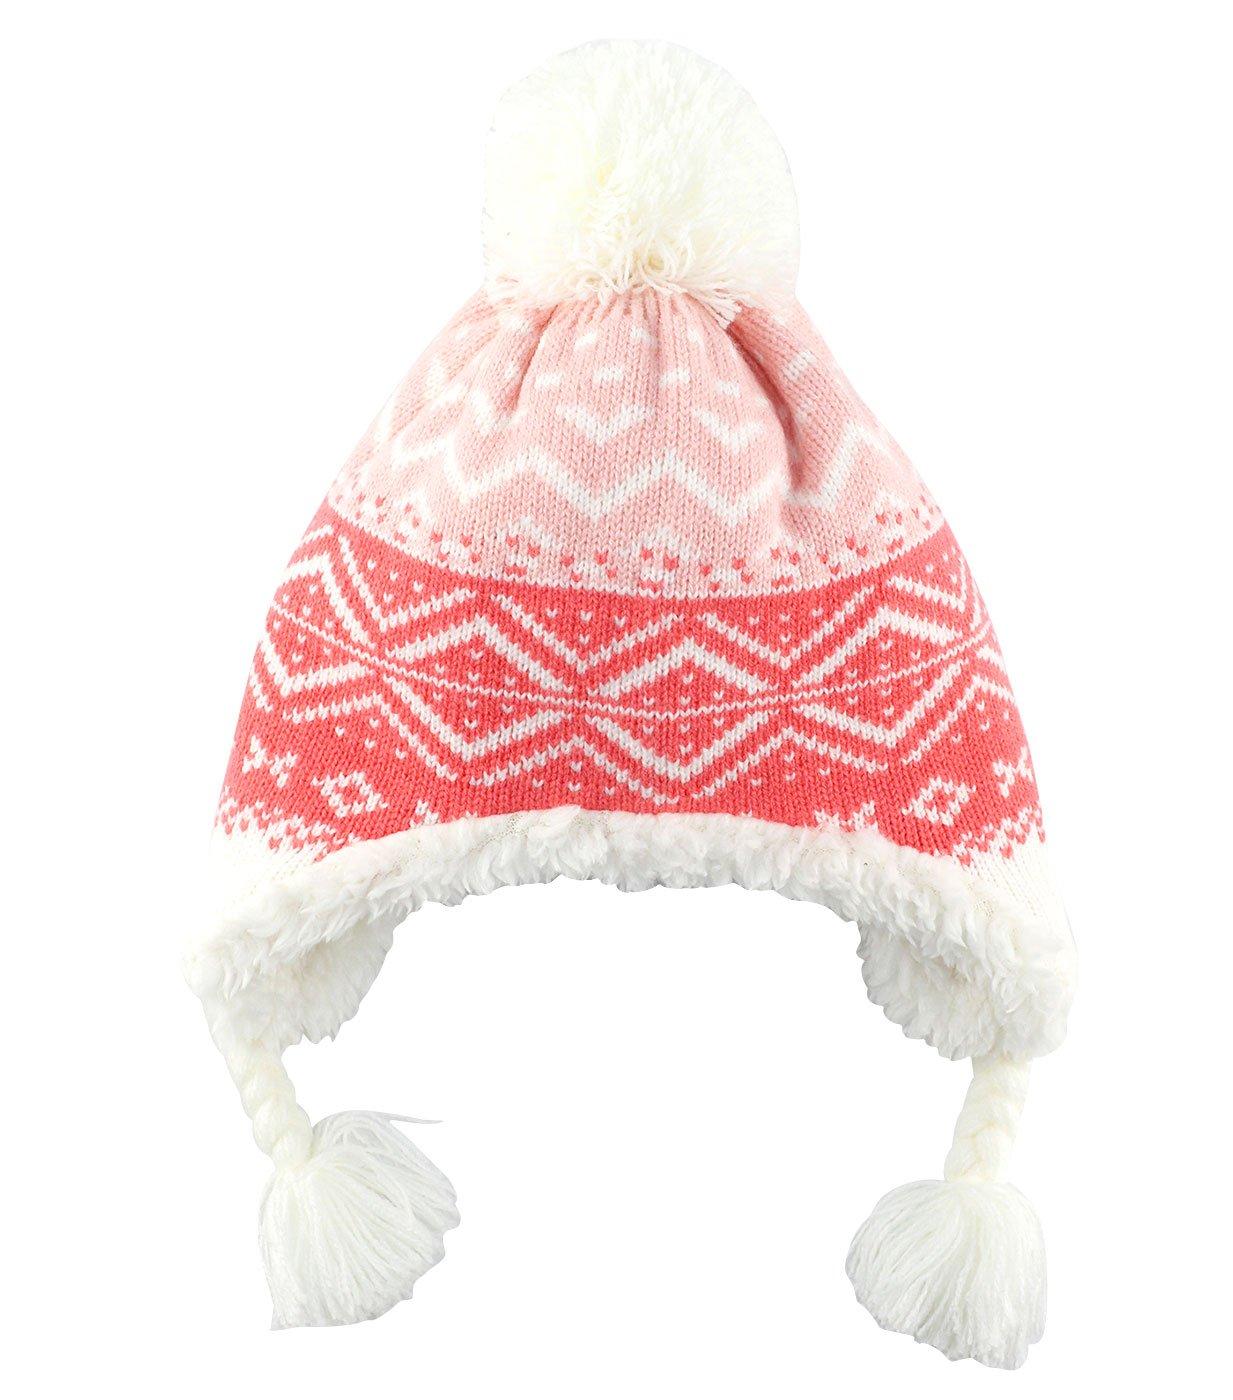 Baby Kids Warm Knit Beanie Hat Toddler Winter Snow Ski Earflap Soft Flannel Hat Earmuff Cap Pink 3-6 T RUHI